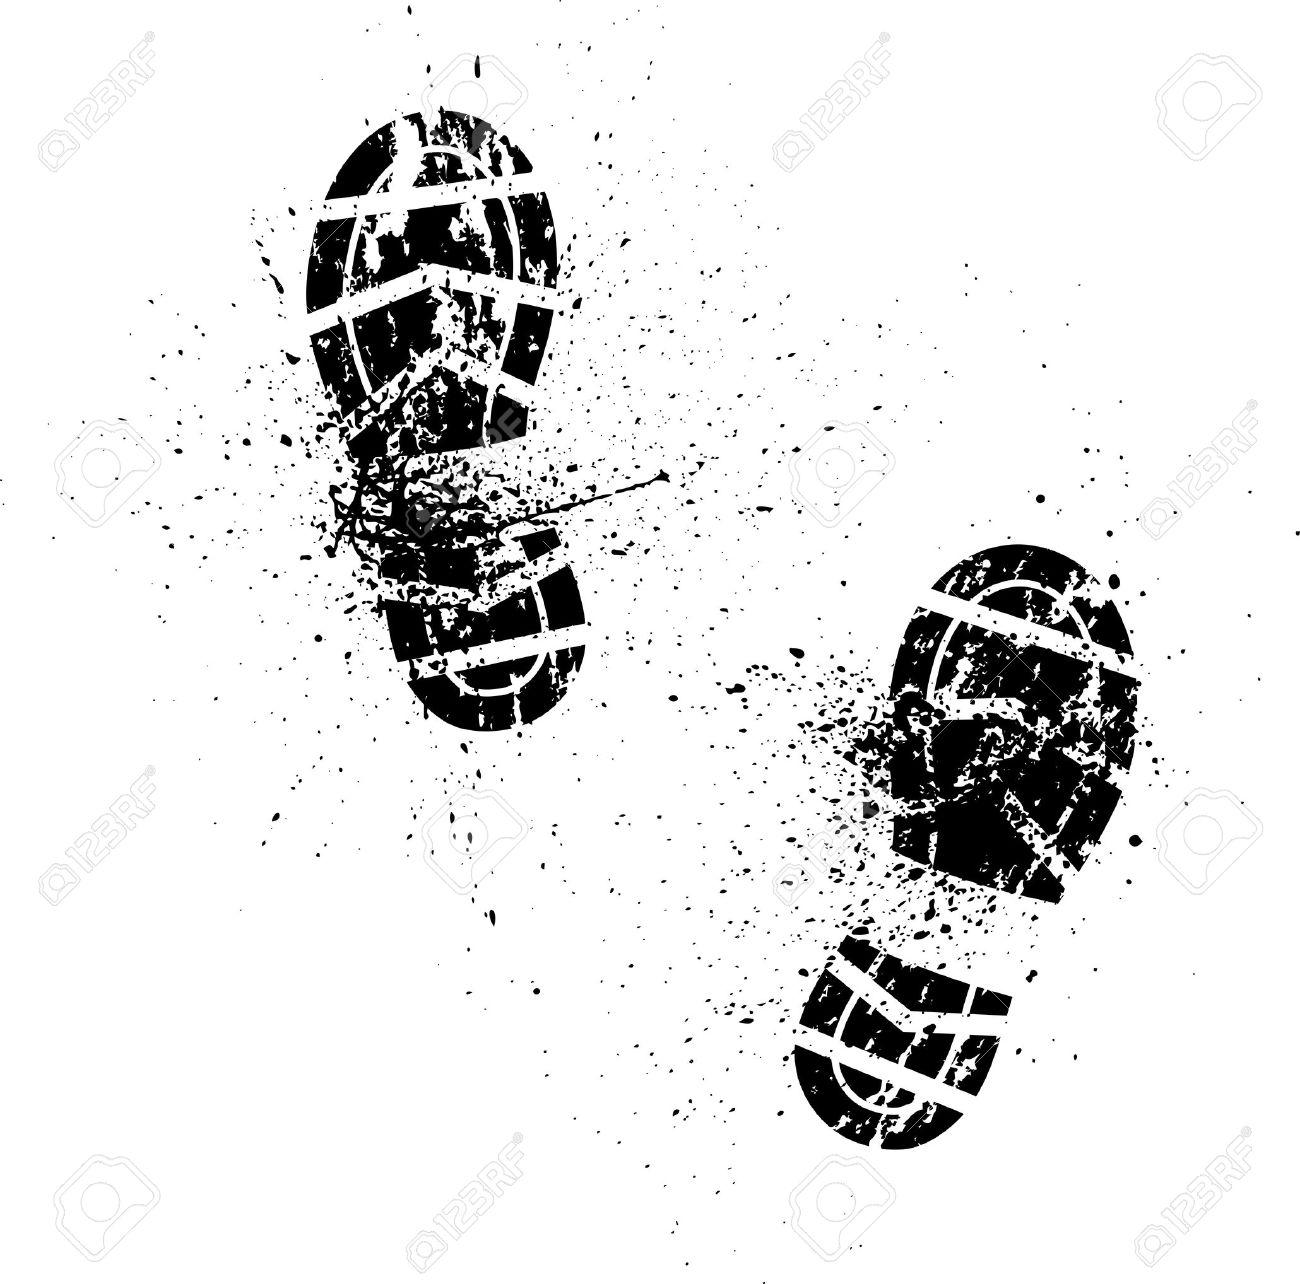 Splash shoe print - 34330413